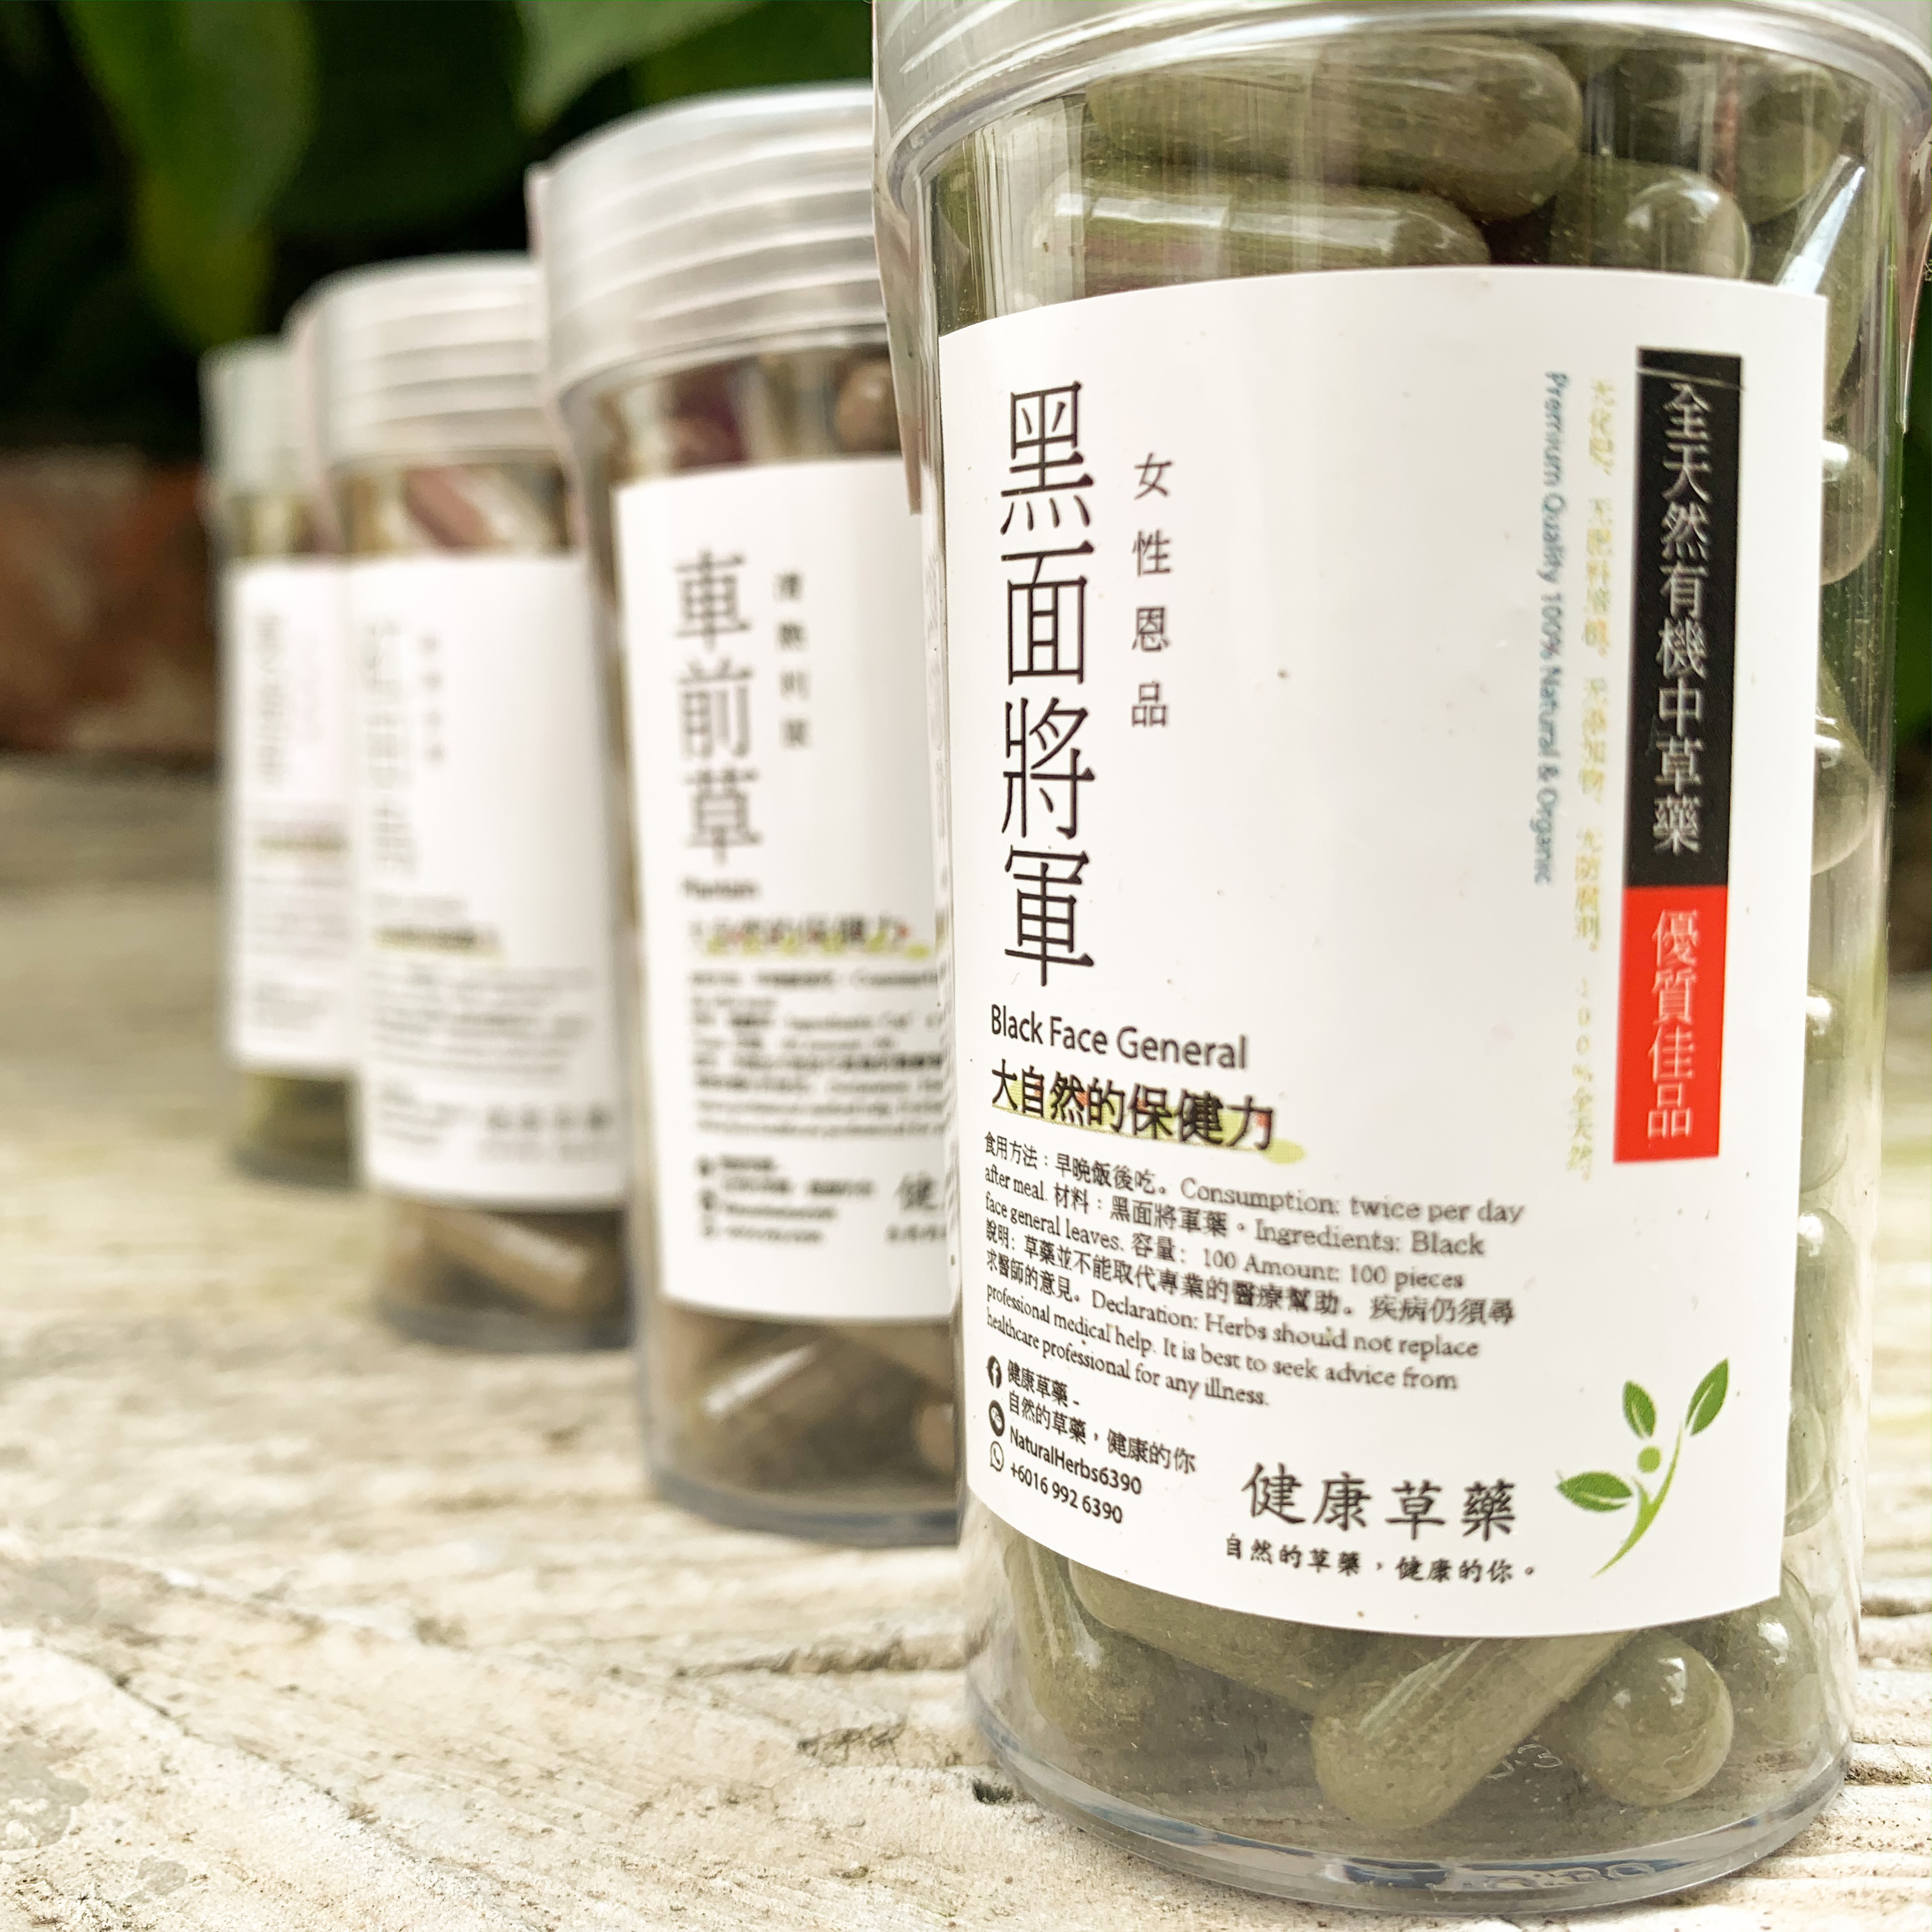 草藥粉 & 膠囊 Herb Powder & Capsules